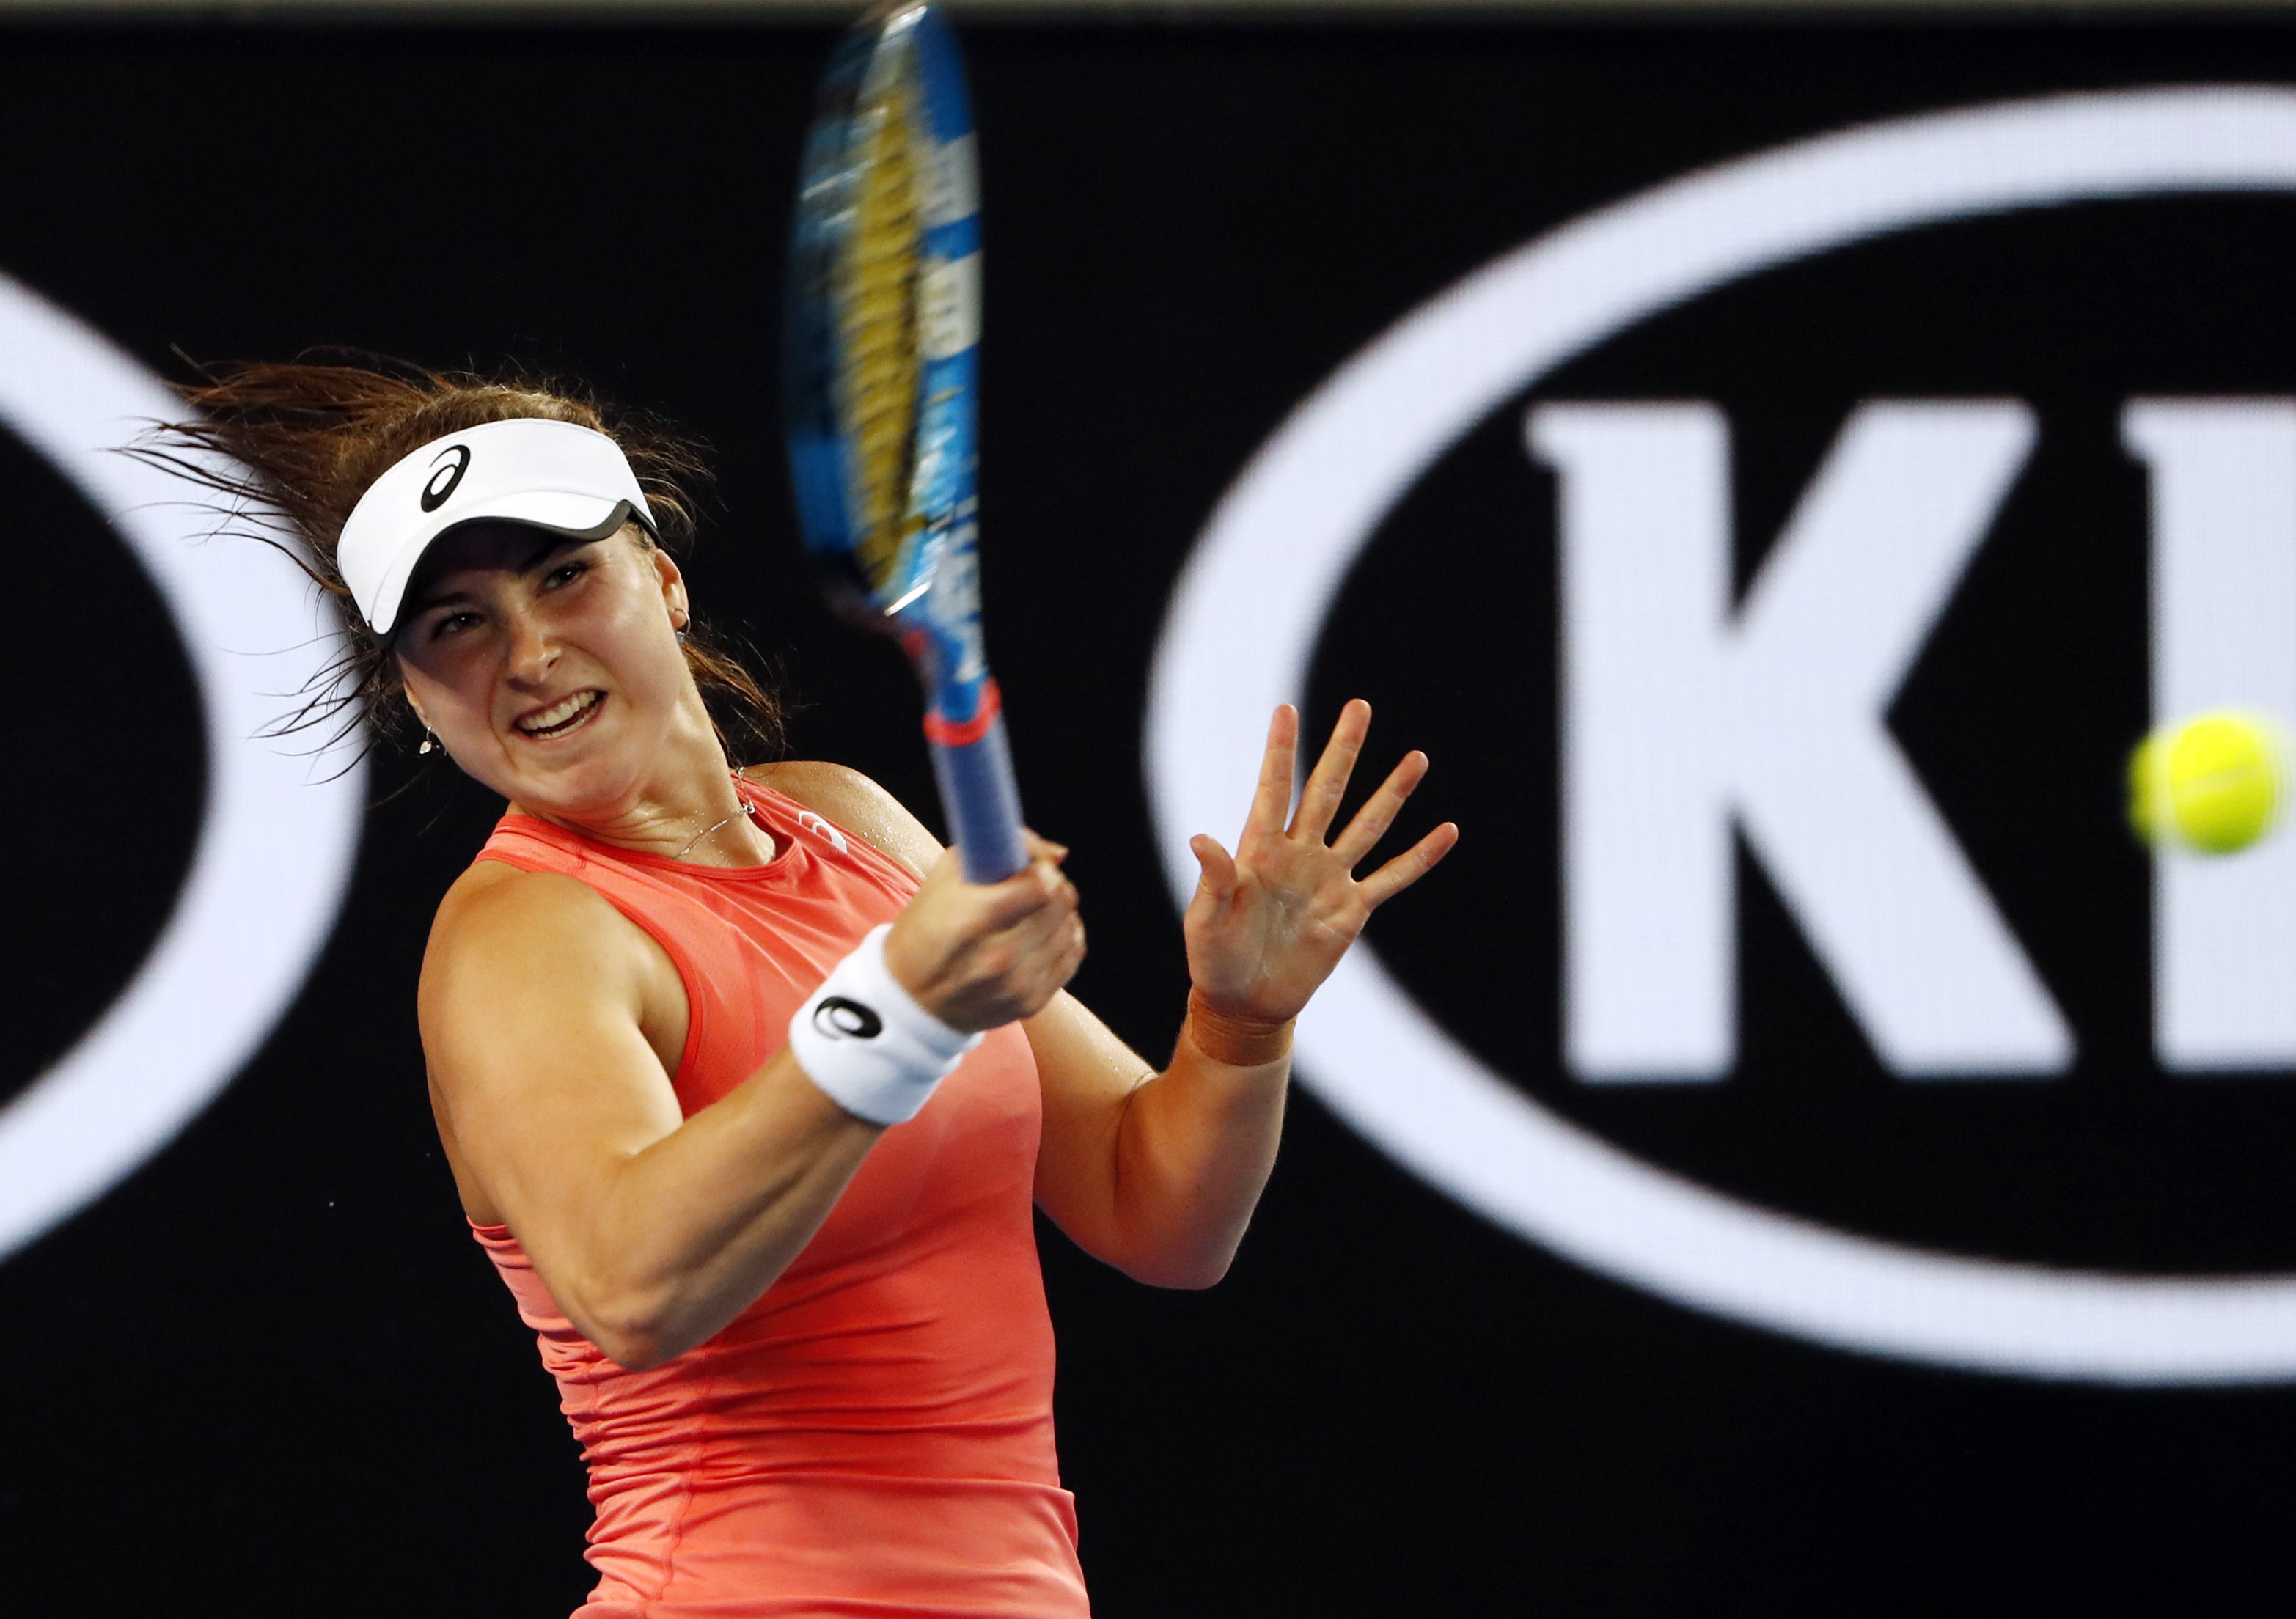 Sweden's Peterson overcomes Watson to win Tianjin Open